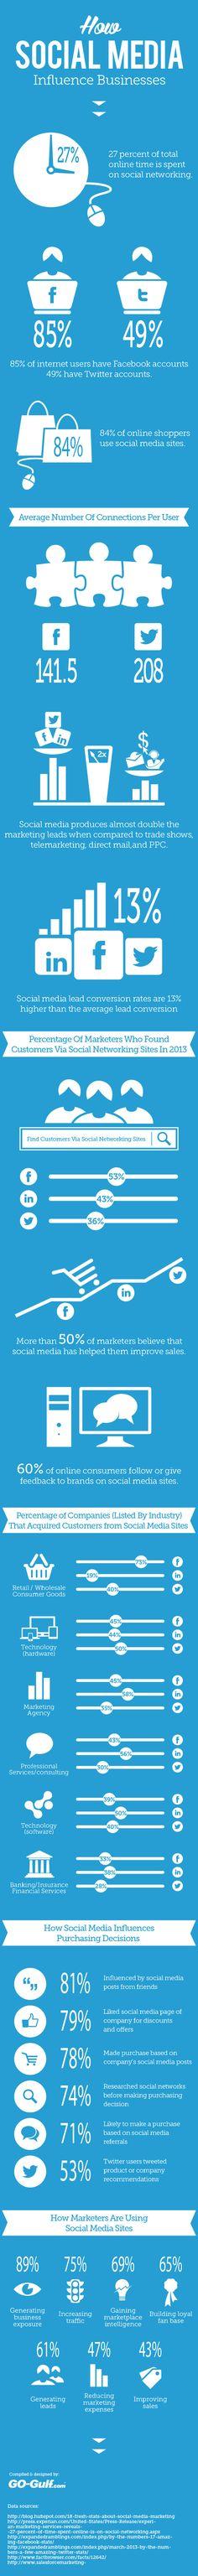 Wi Social Media das Geschäft beeinflusst, Leads generiert und den Vertrieb ankurbelt #Infographic